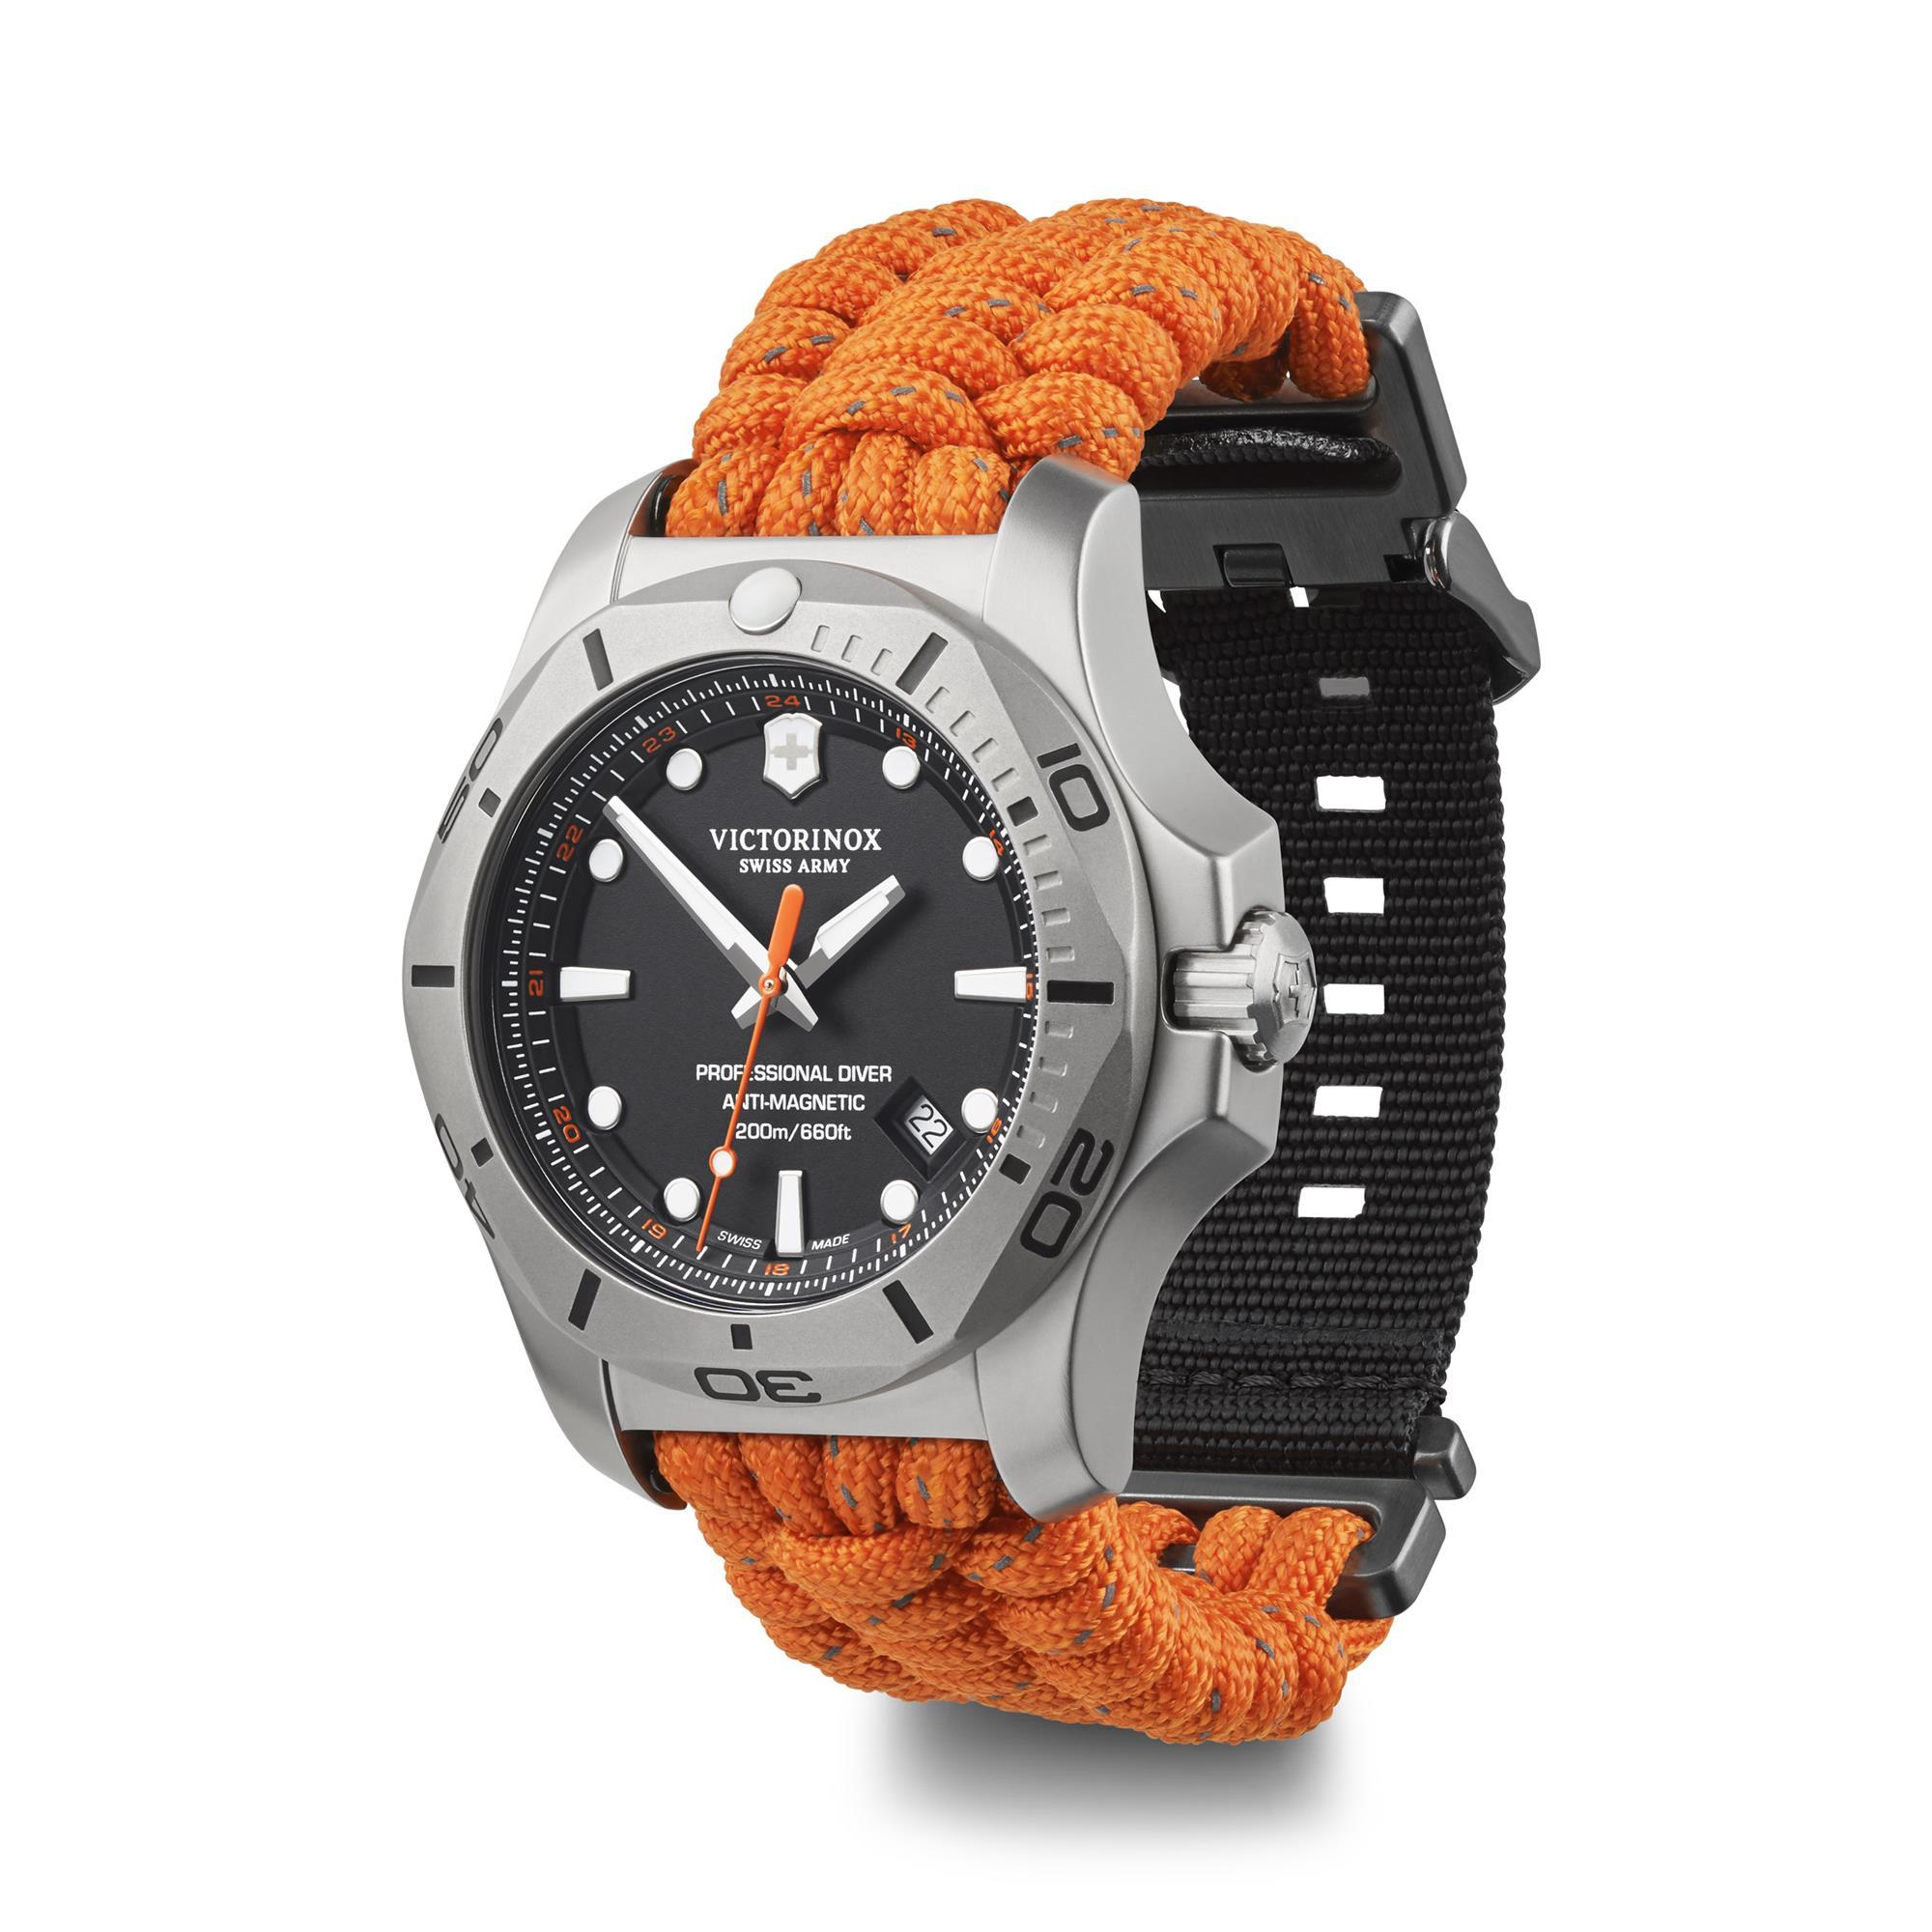 Victorinox I N O X Professional Diver Orange Paracord Strap Mens Watch 241845 45mm